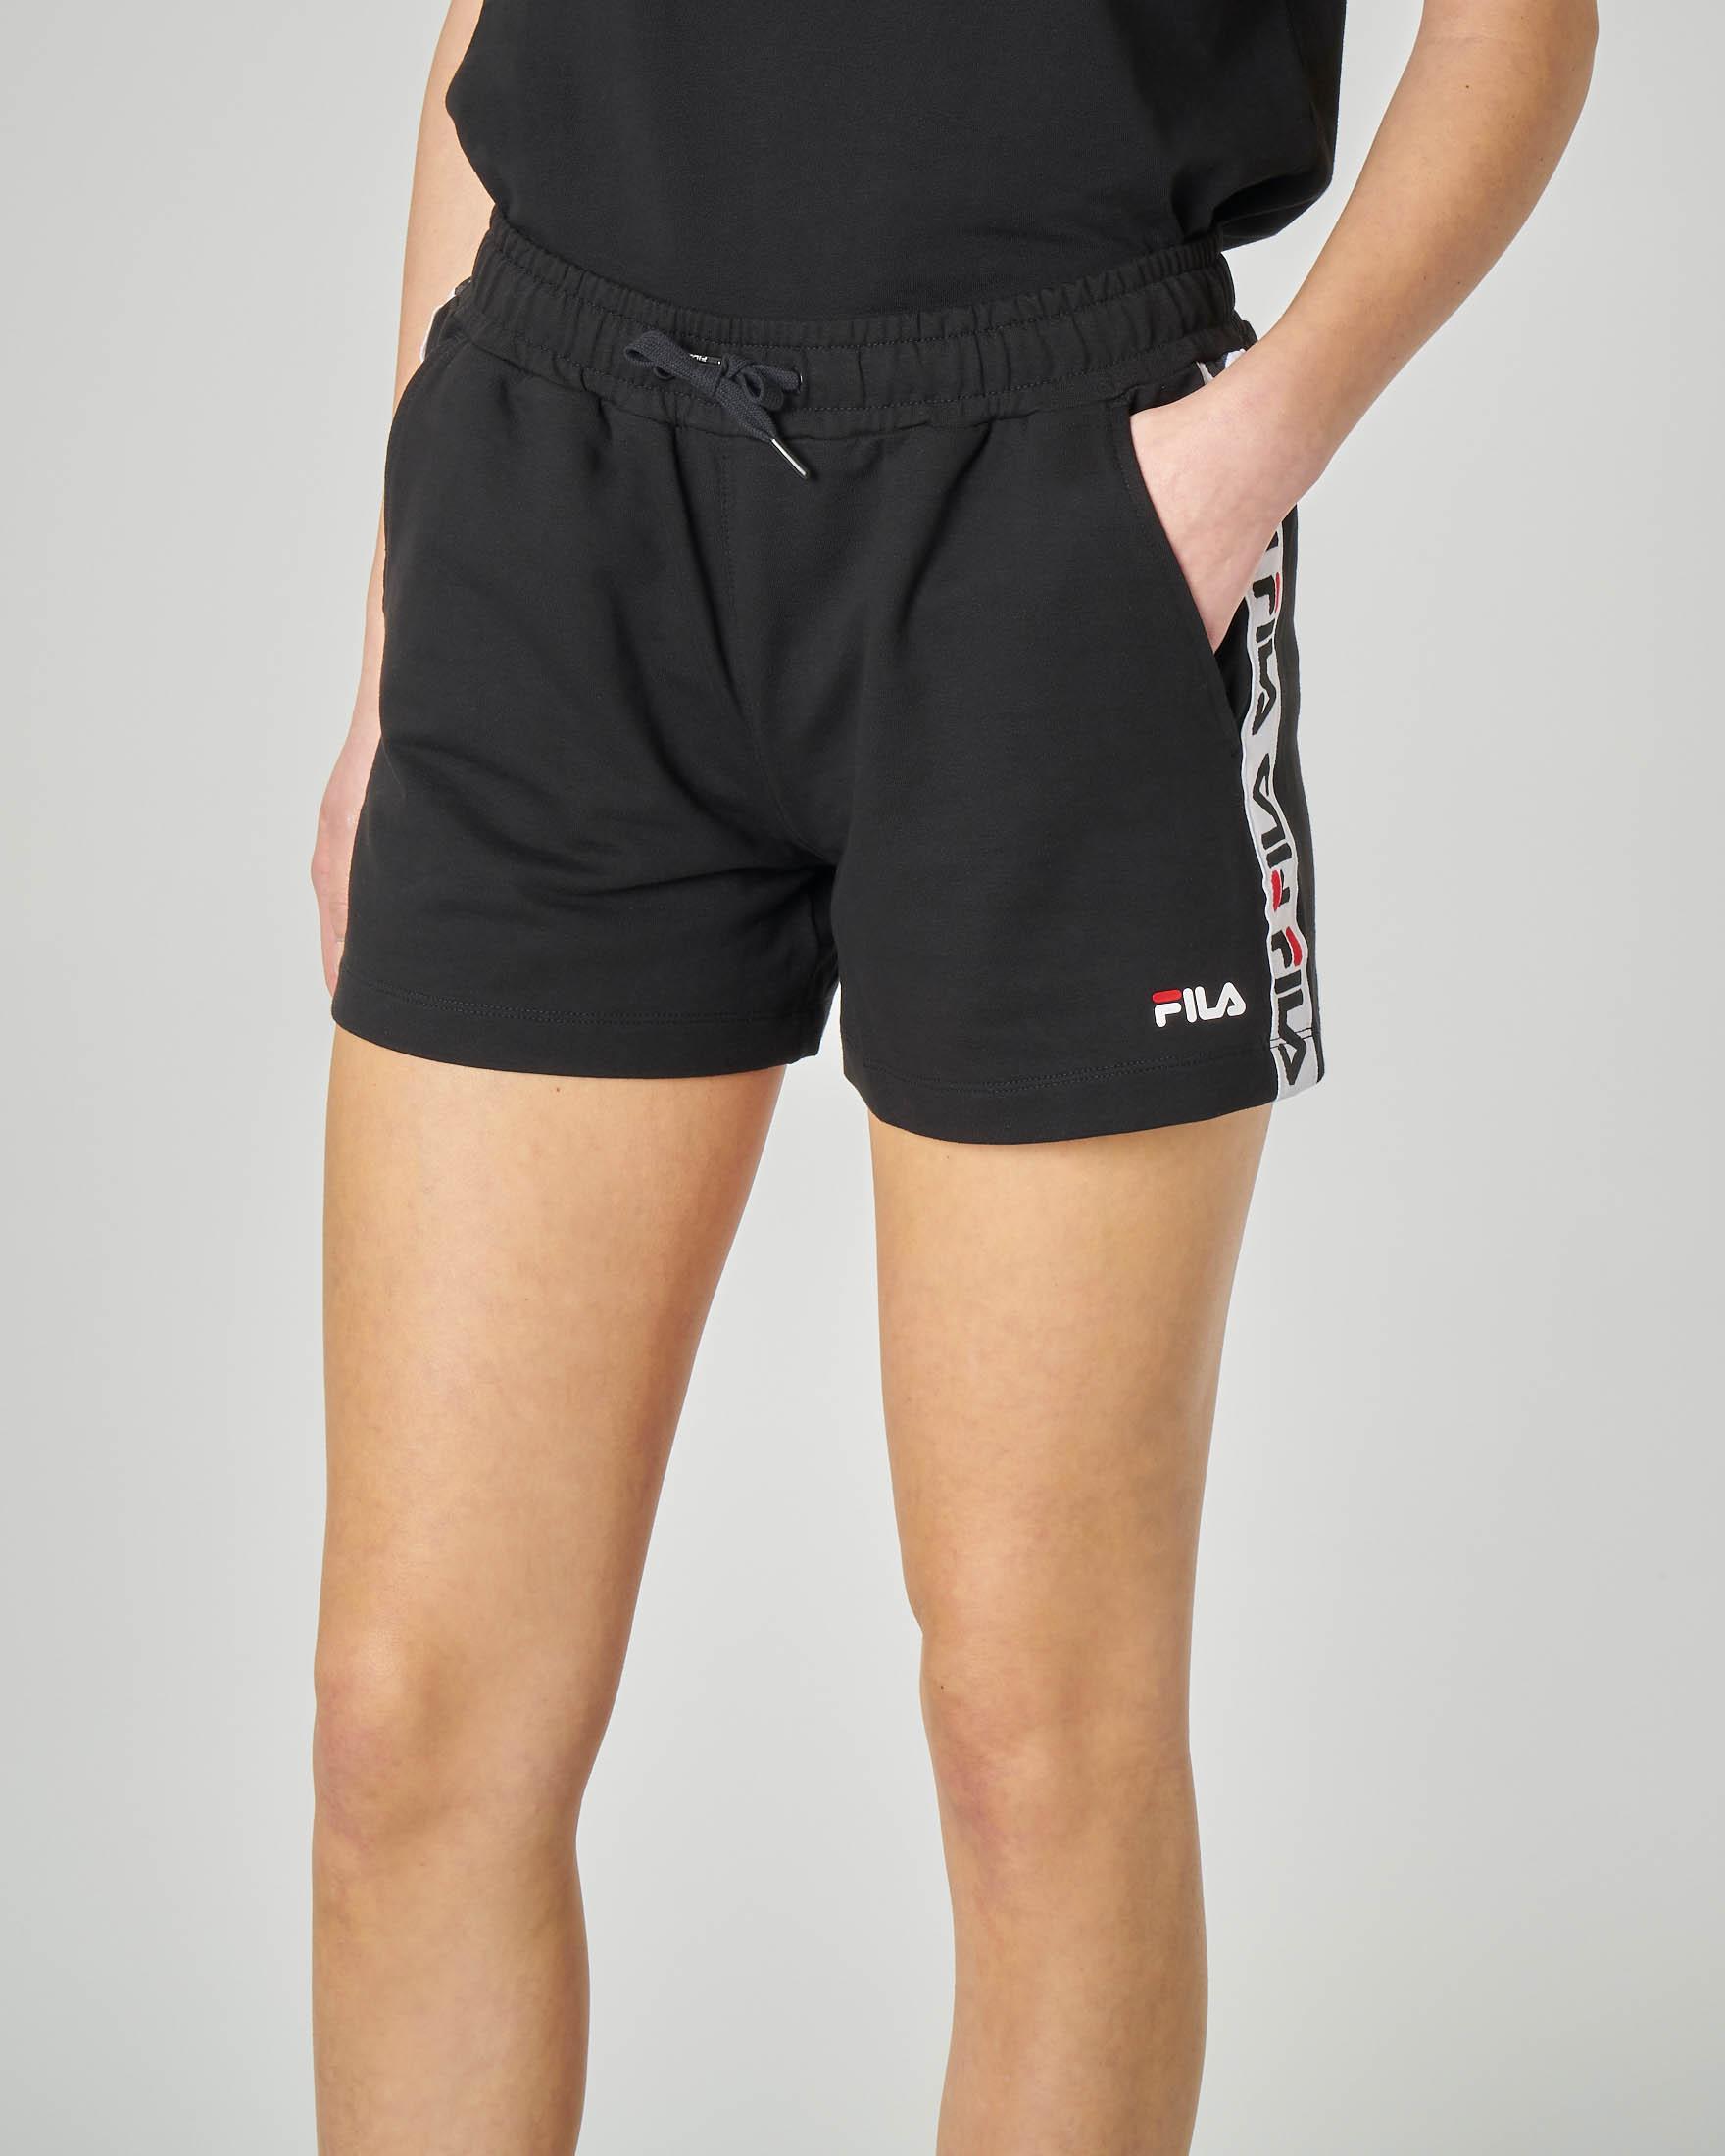 Shorts in felpa neri con banda logo laterale